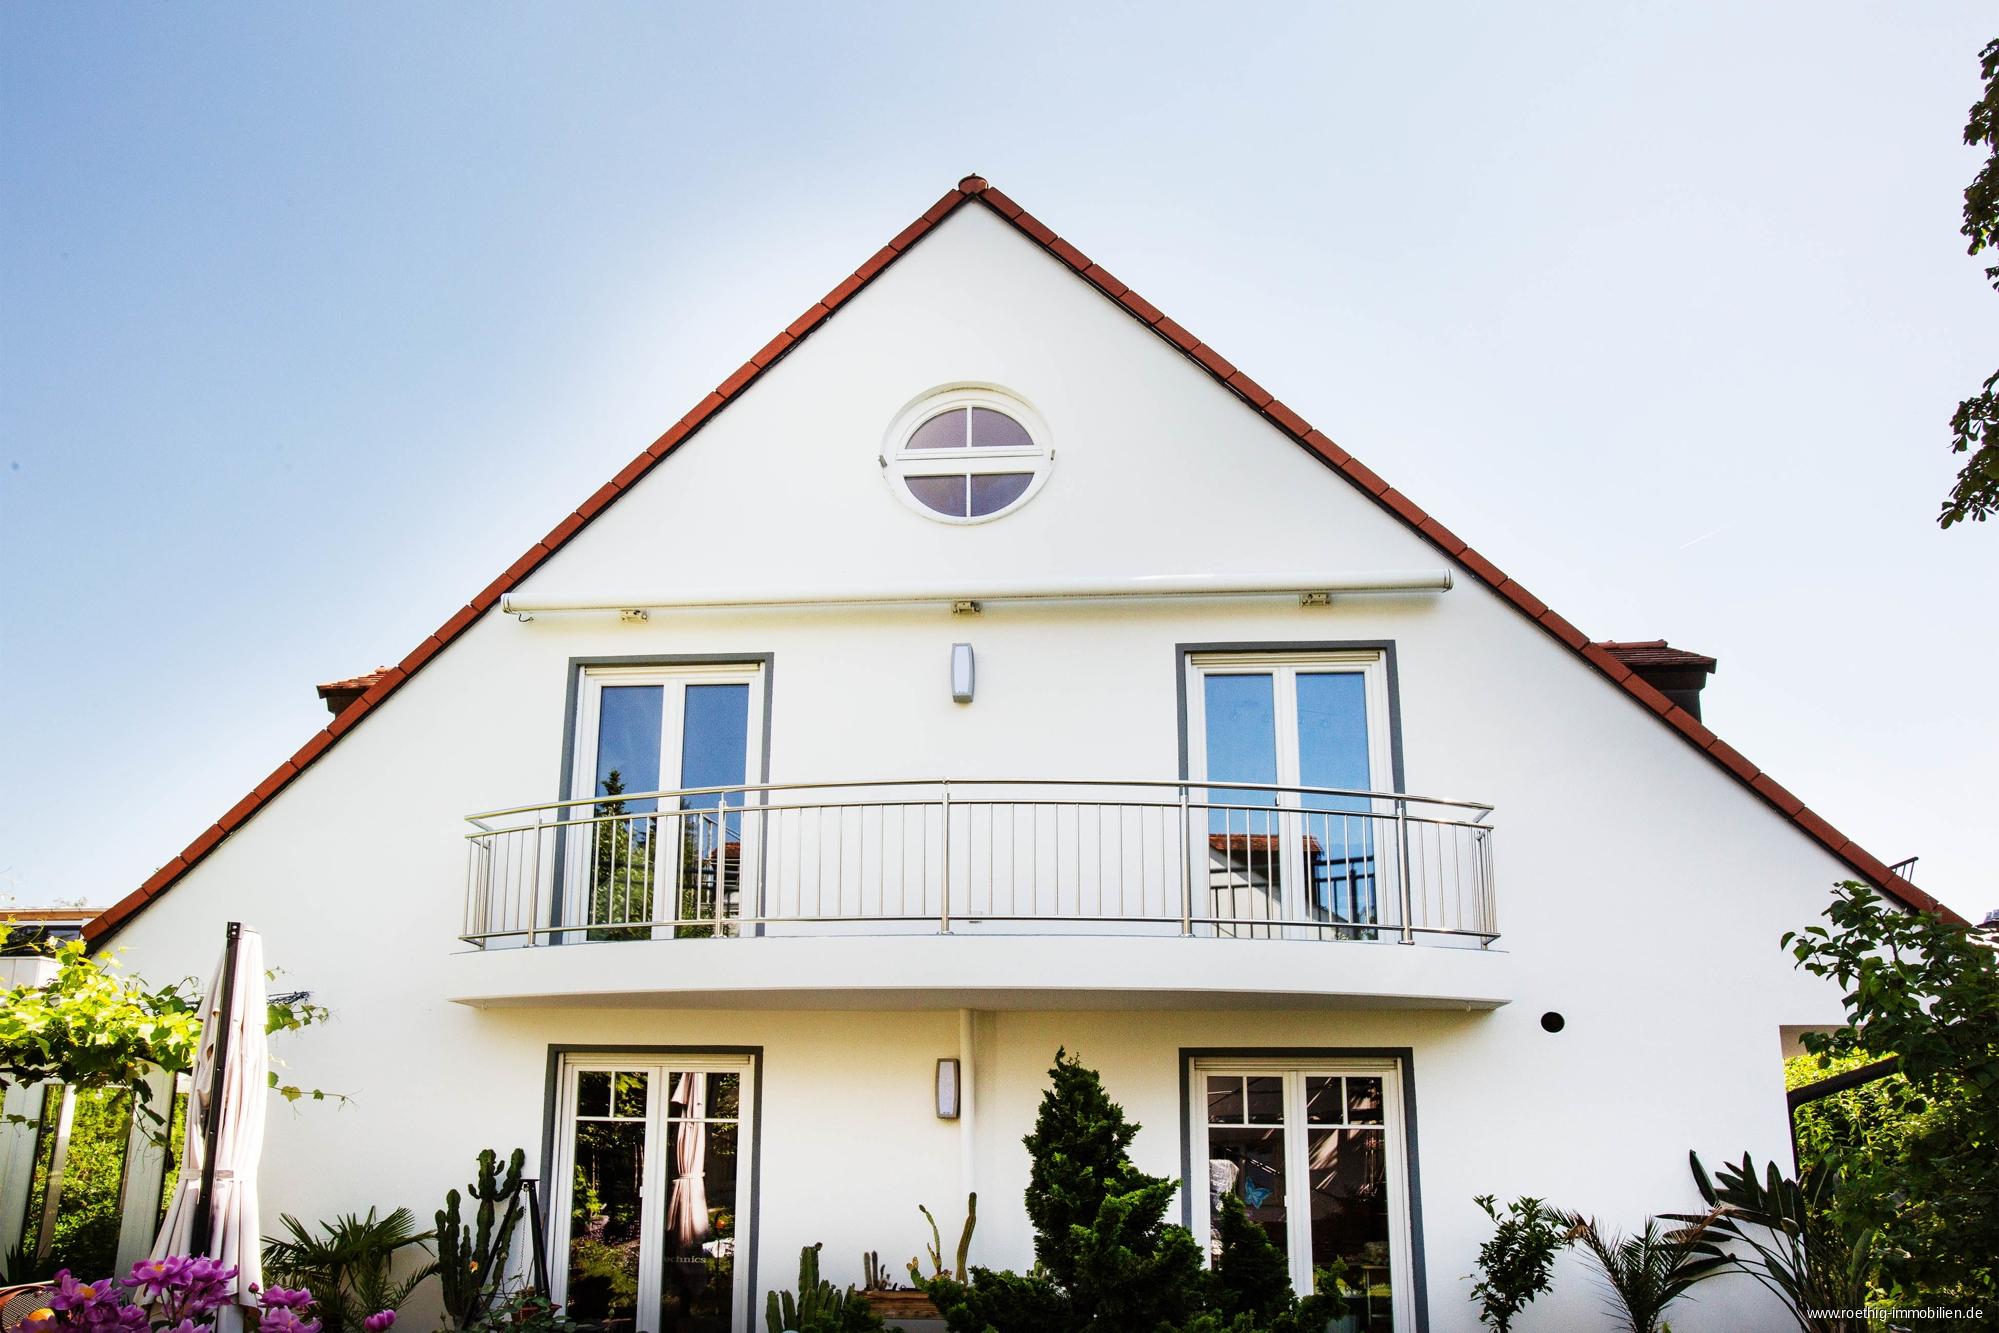 Familienwohntraum! 3-Zimmer-Maisonette-Dachgeschoss-Wohnung ...